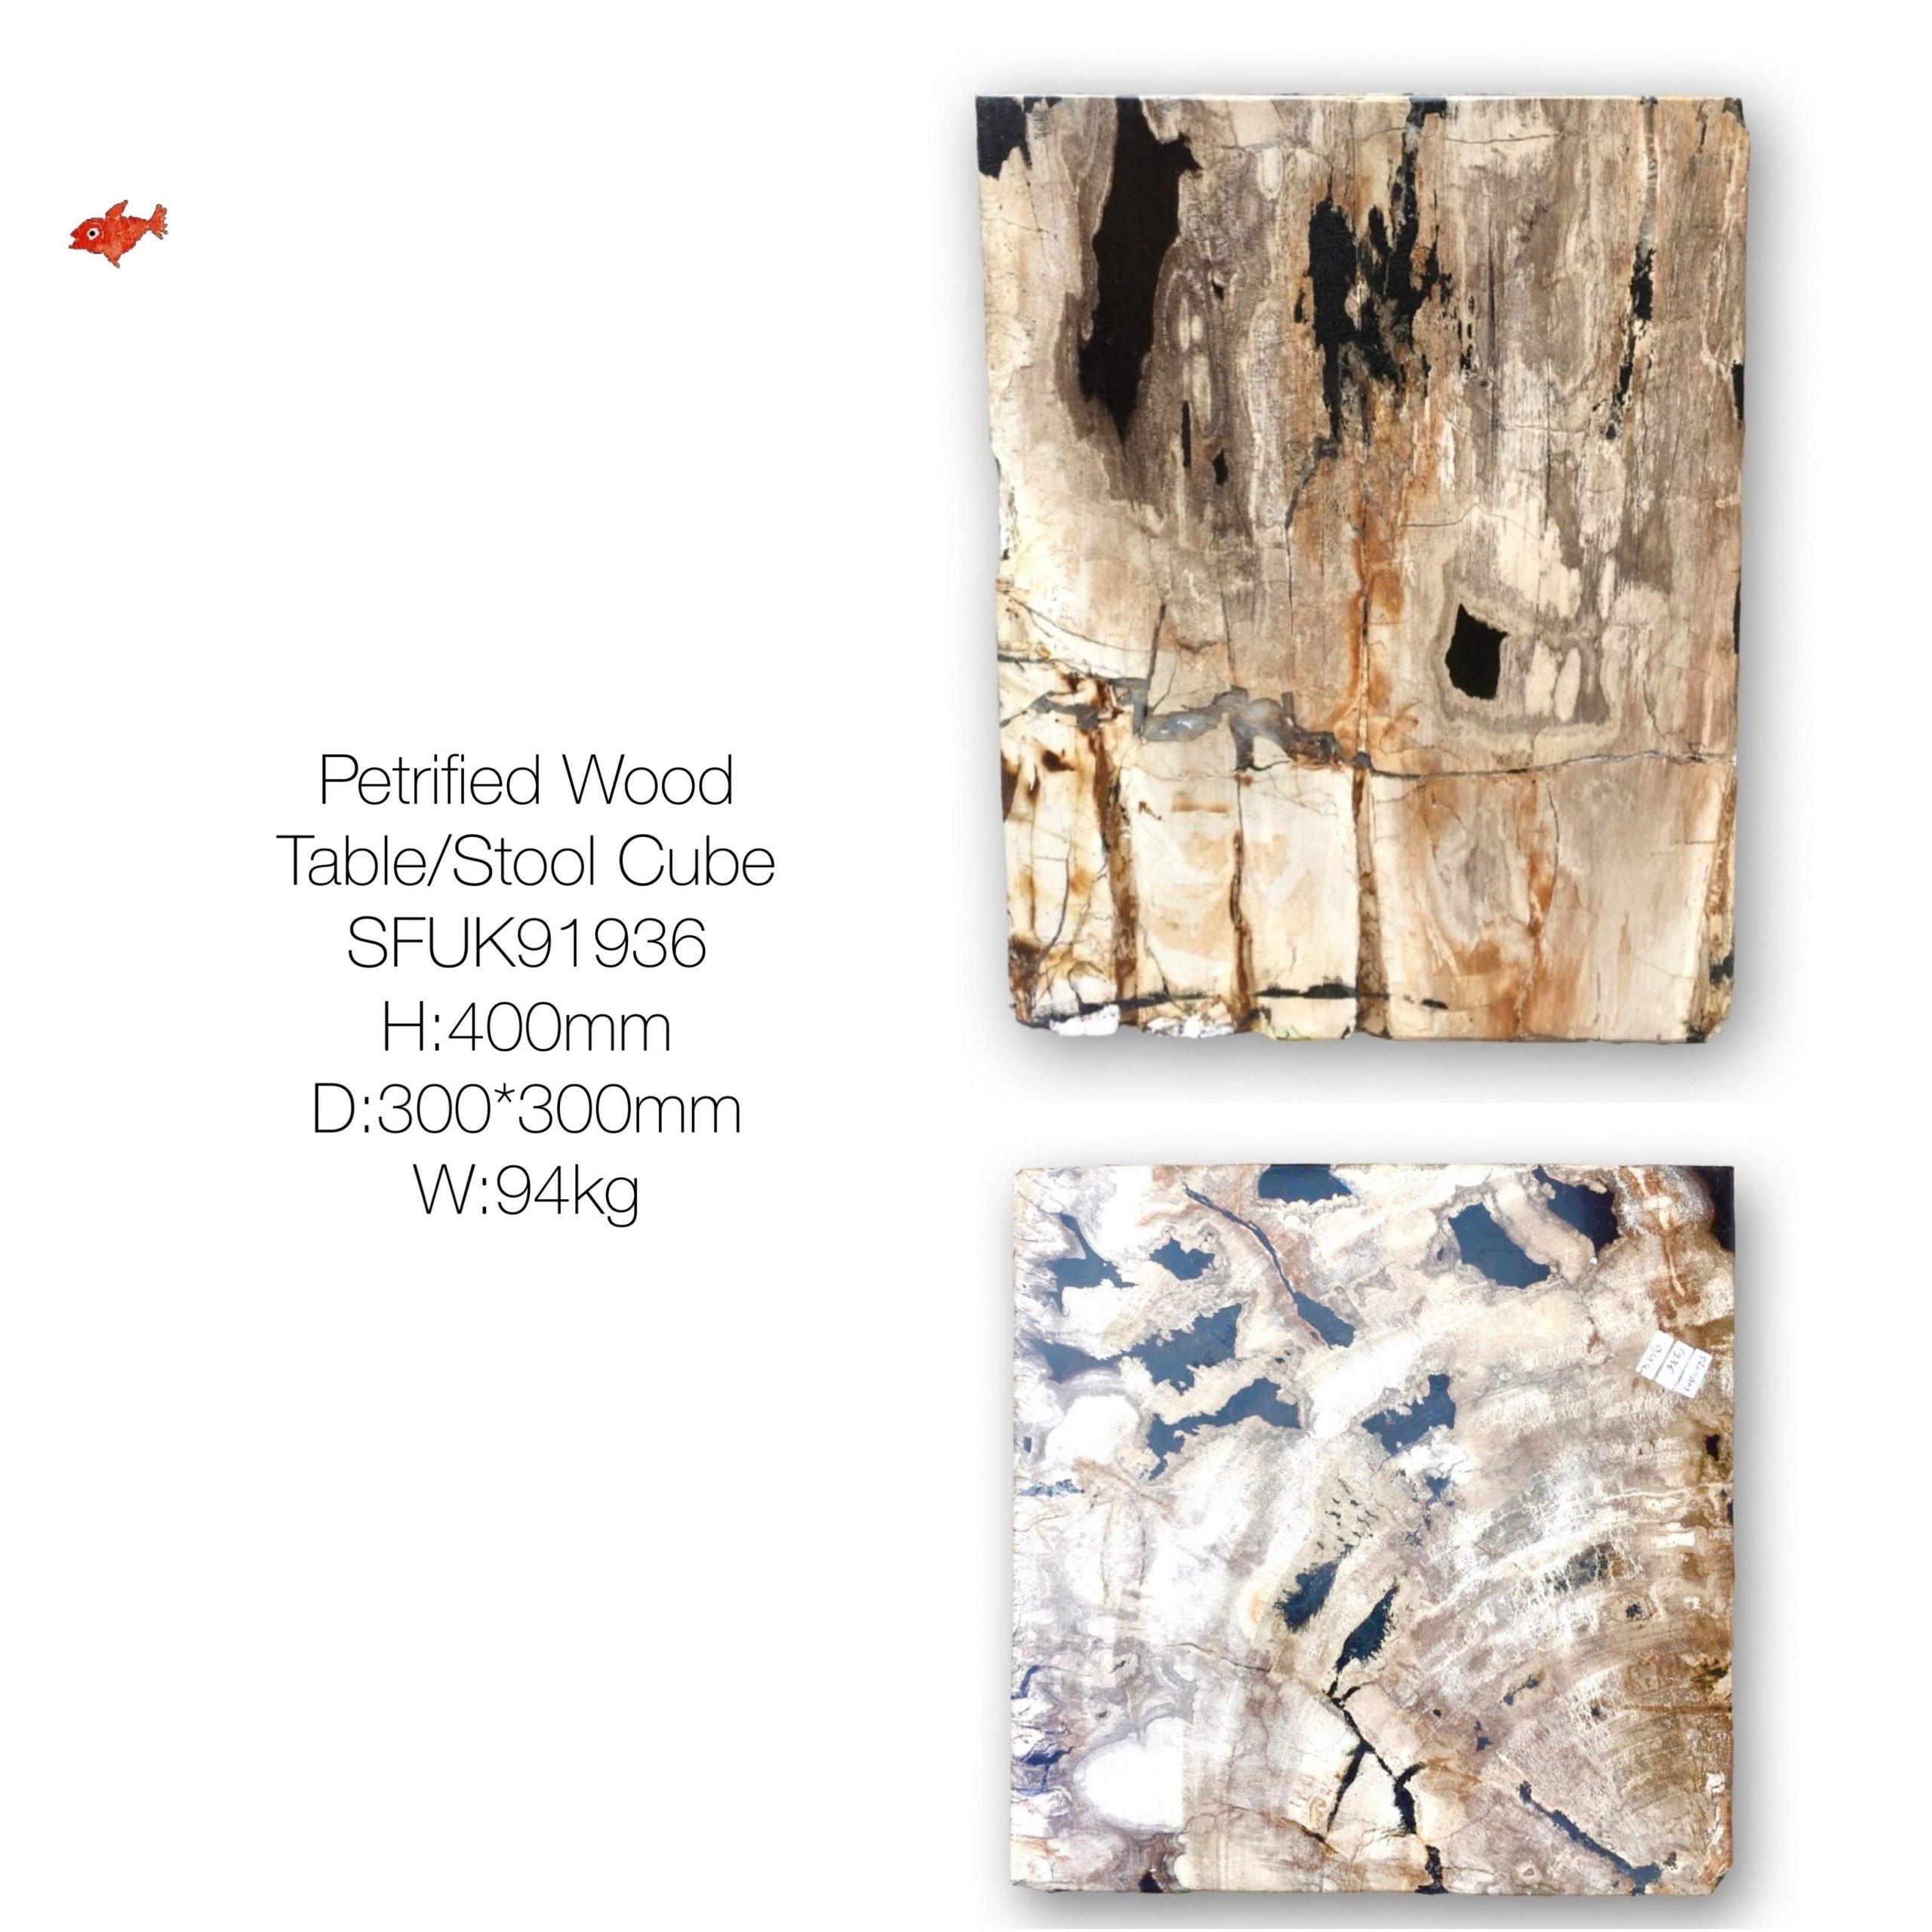 Petrified Wood Cube